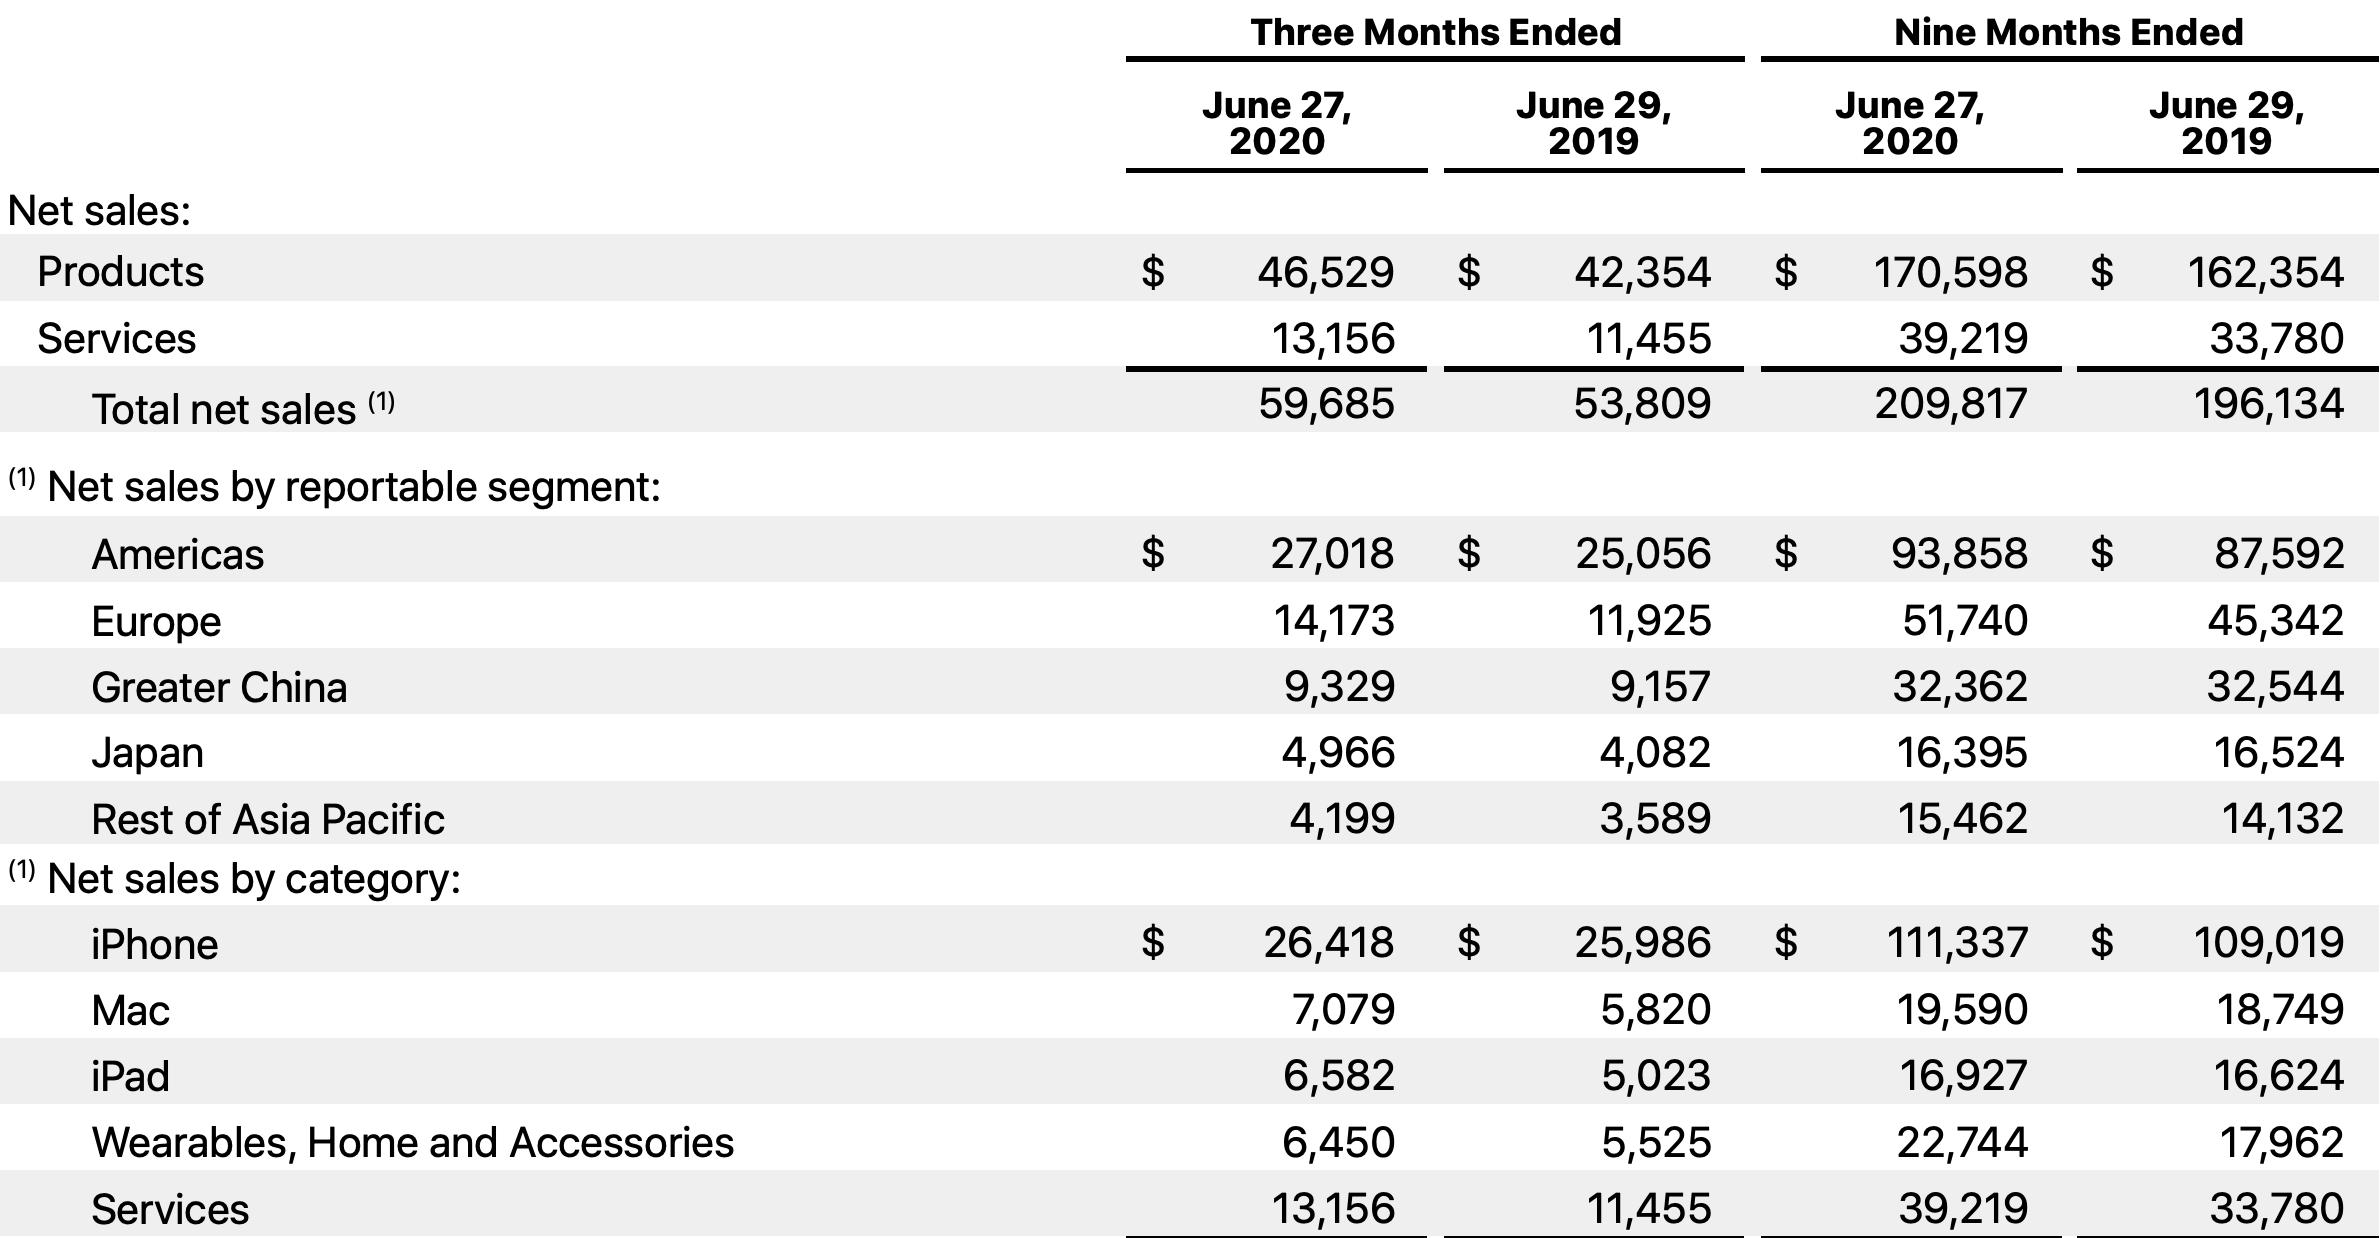 Wyniki finansowe Apple Q3 2020 FY